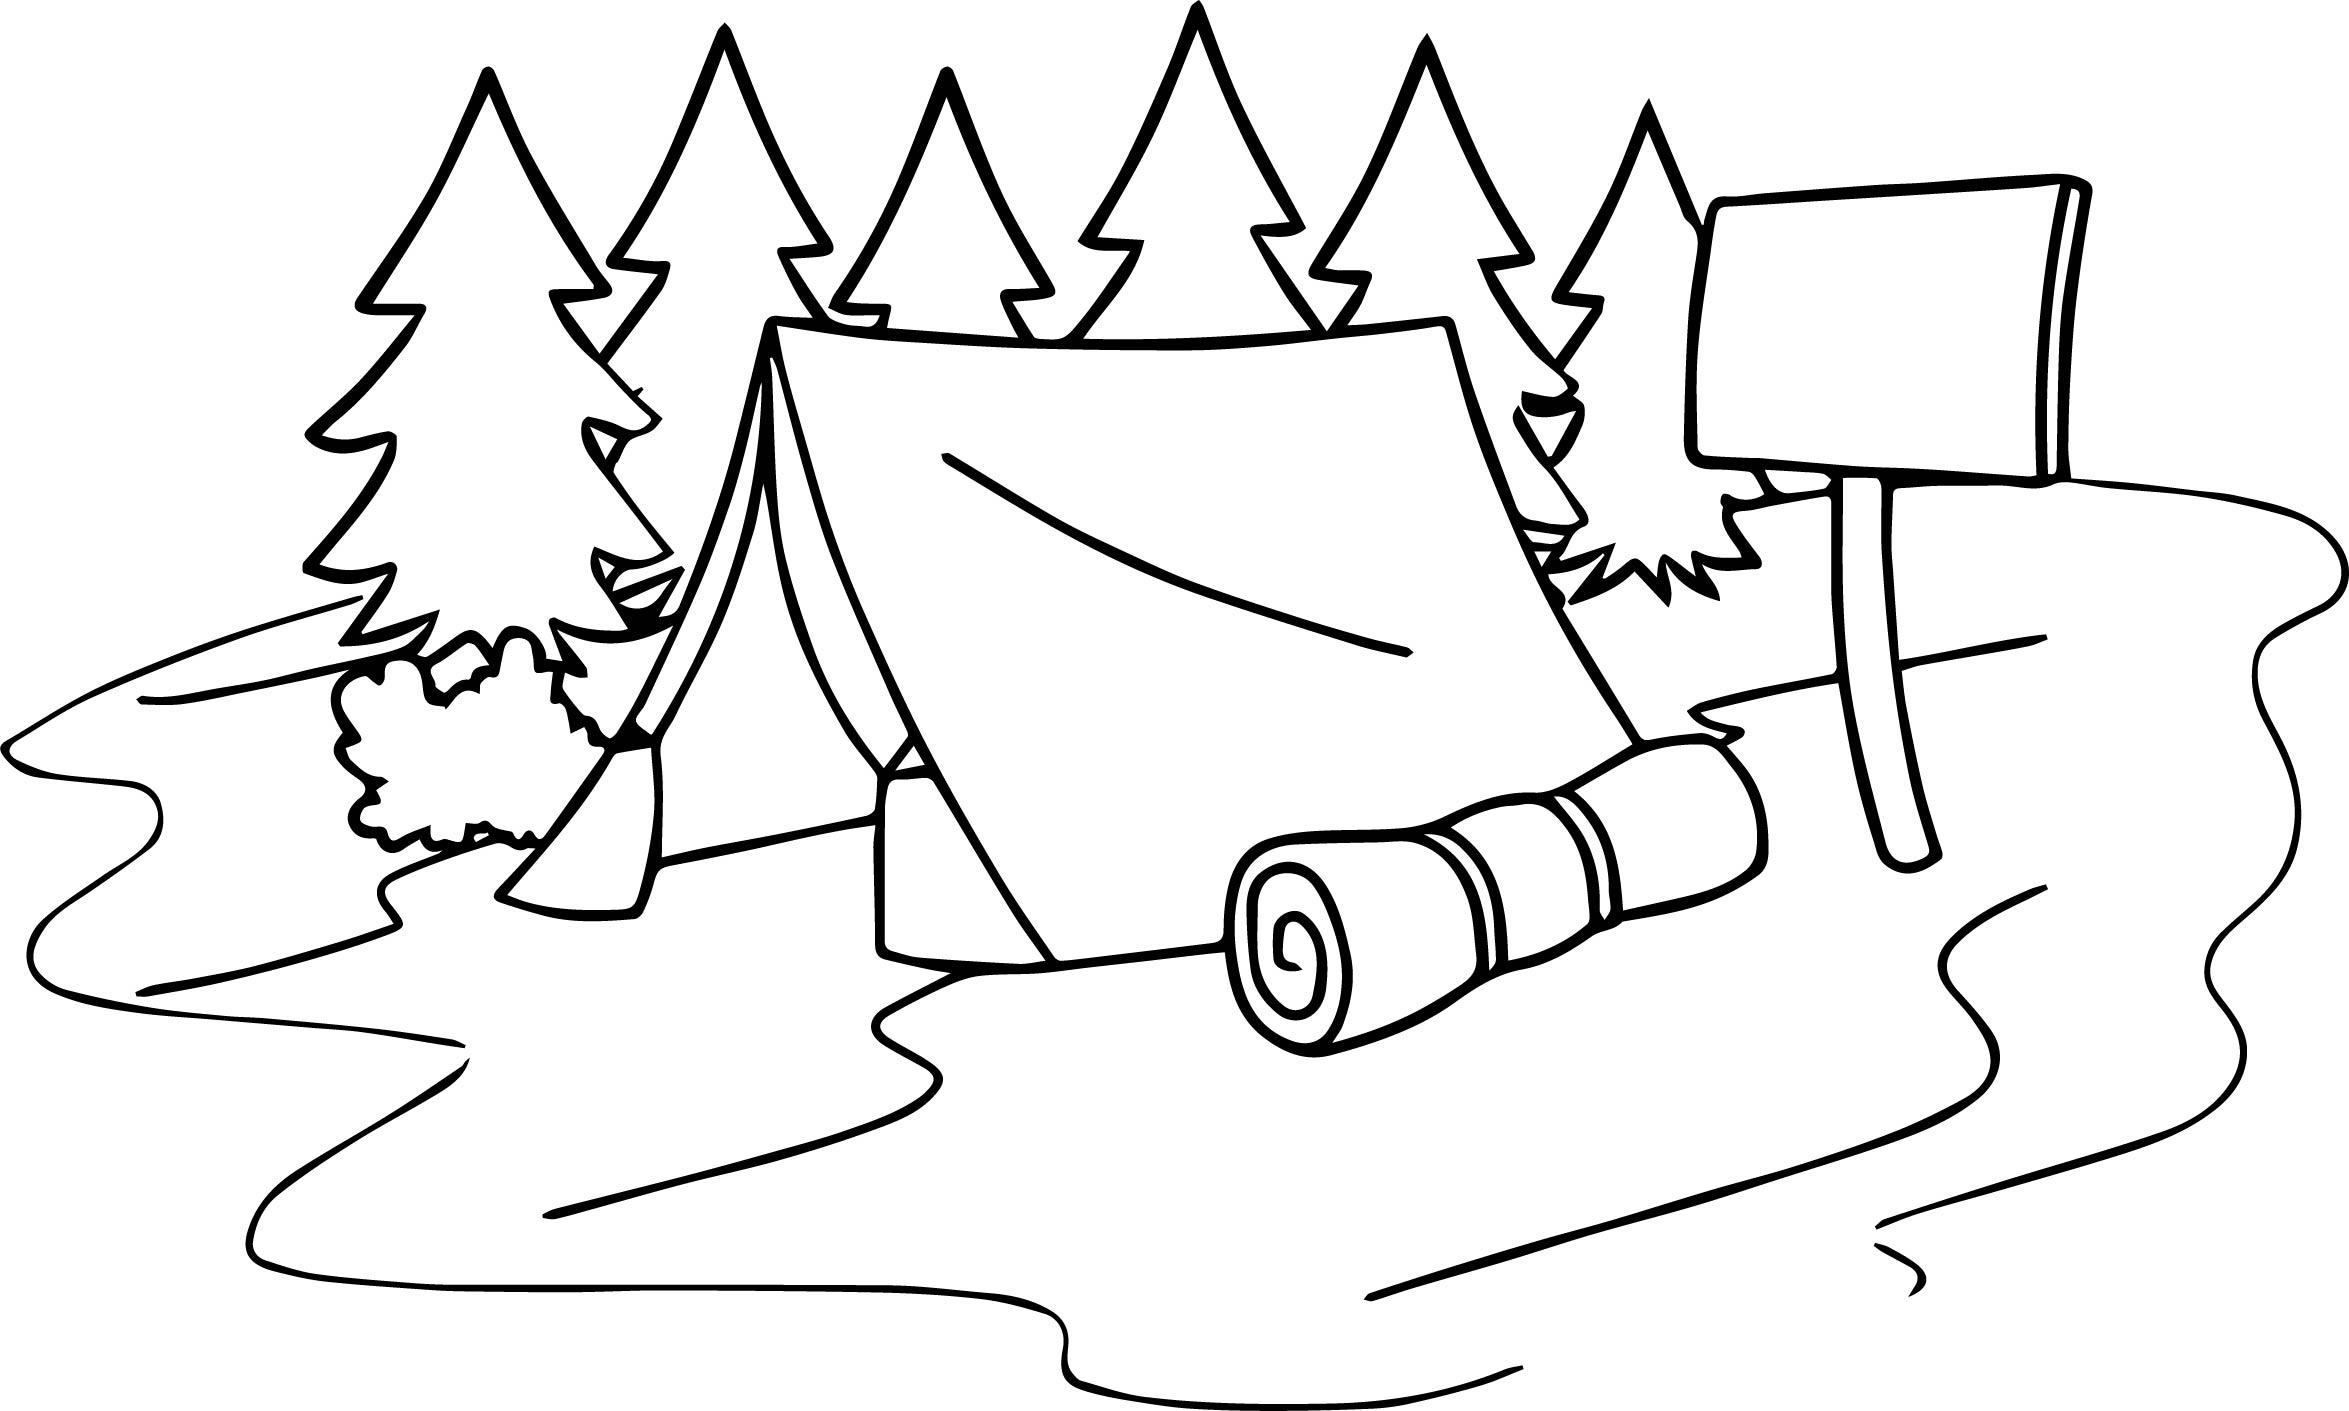 Summer Camp Tent Sleeping Bag Camping Coloring Page